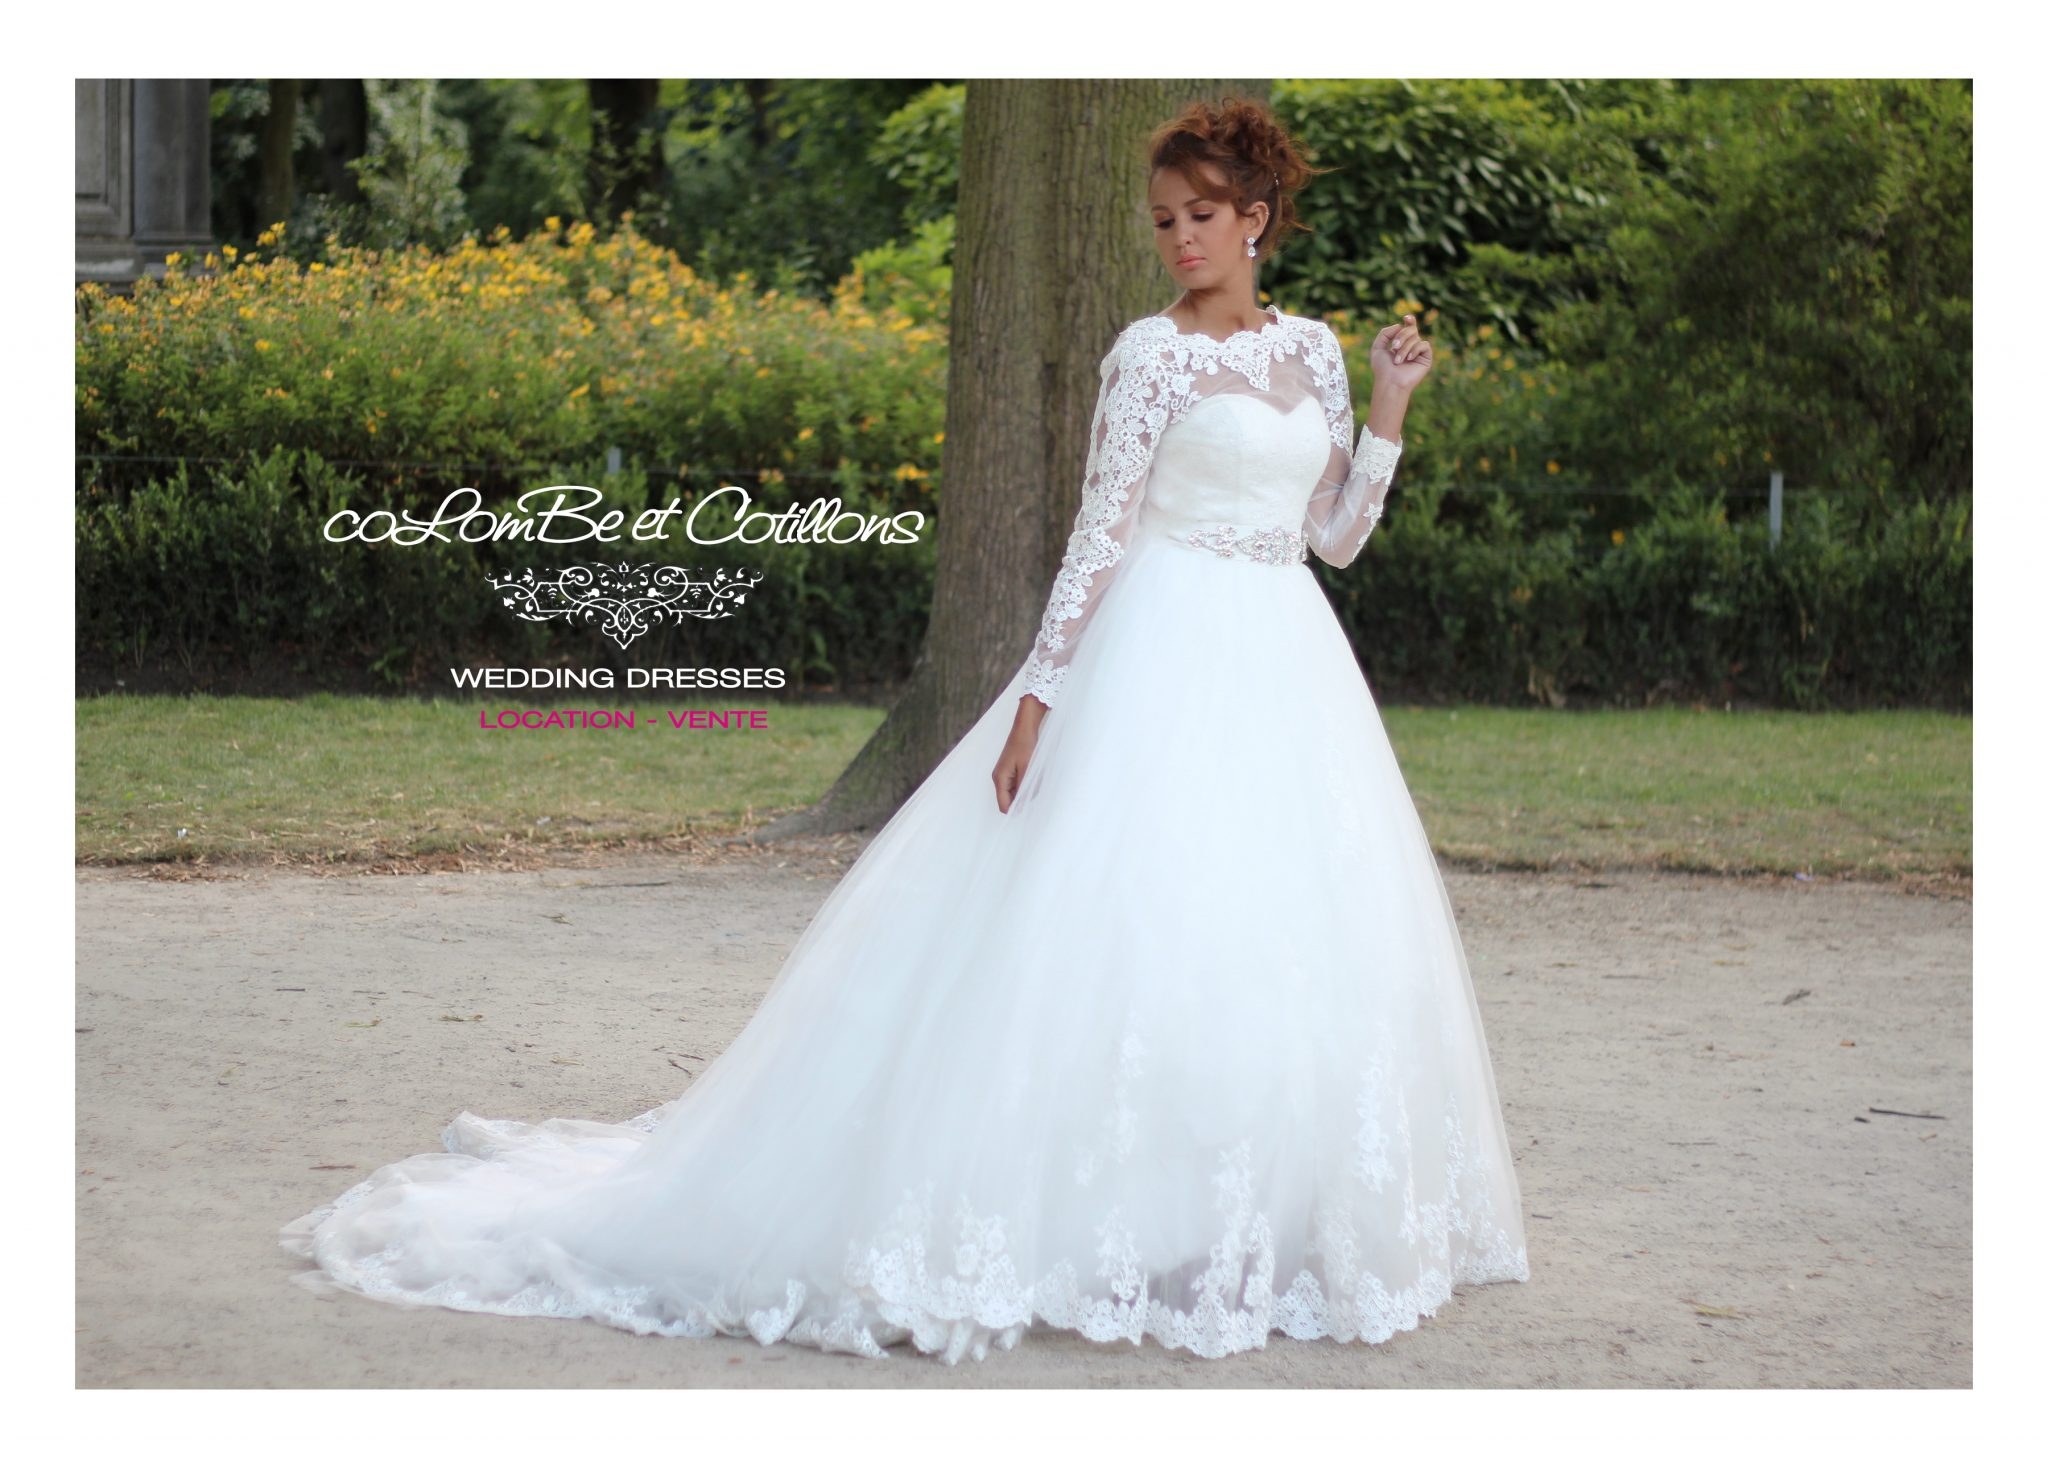 A louer robe de mariee for Louer la robe de mariage de piste